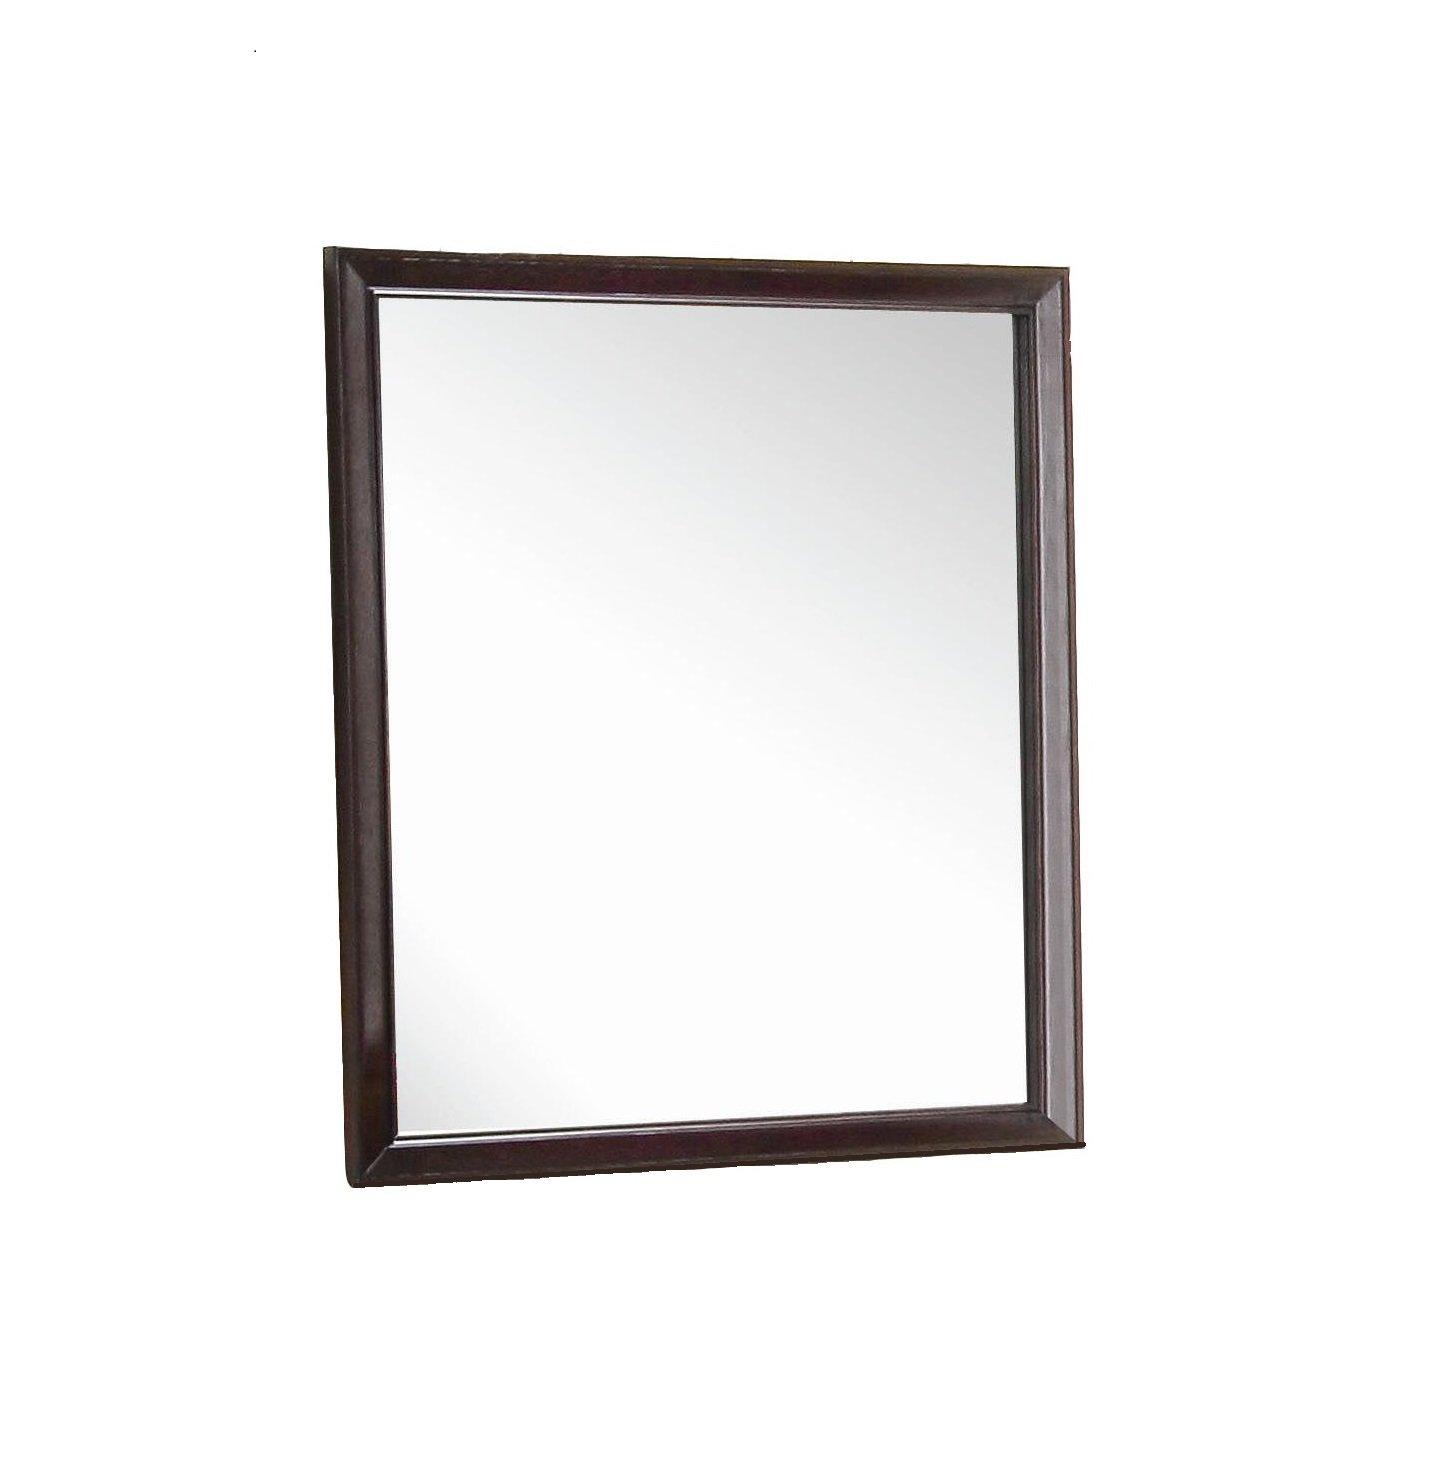 New Spec Modern Styled Mirror Wood Laminate Frame Goes Well with Otago Set, Dark Brown